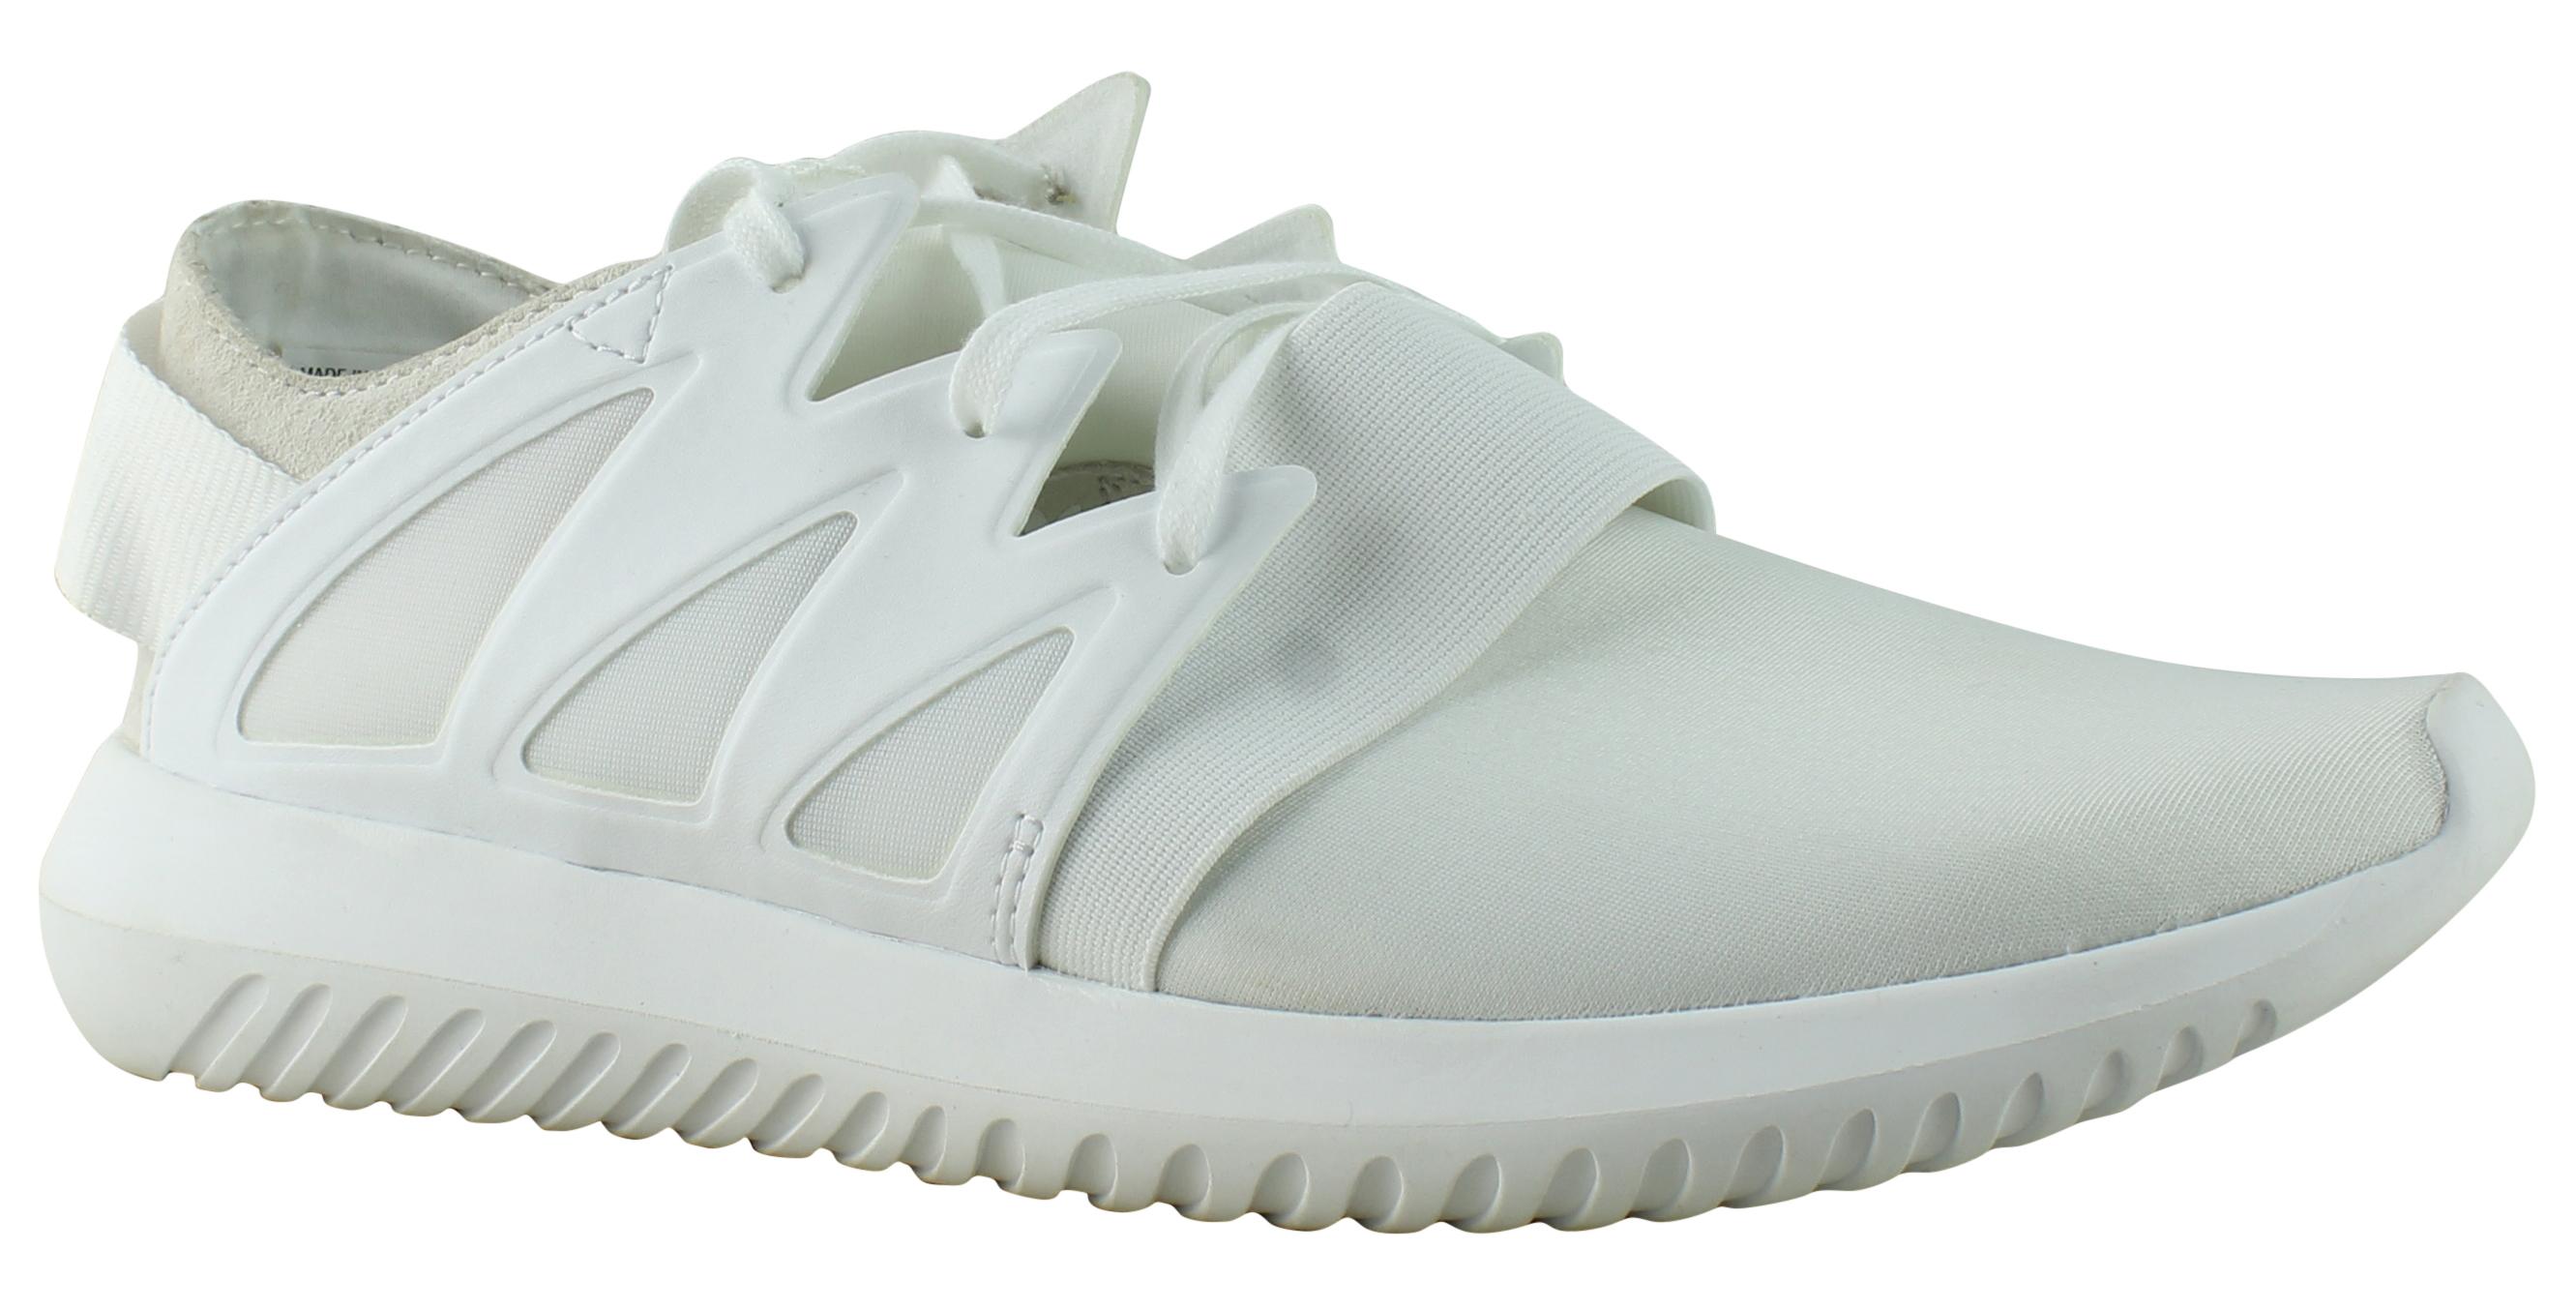 3aa4b3fbe3 Adidas white scarpe taglia 11 (362829) Uomo - nnswjl1132-scarpe ...